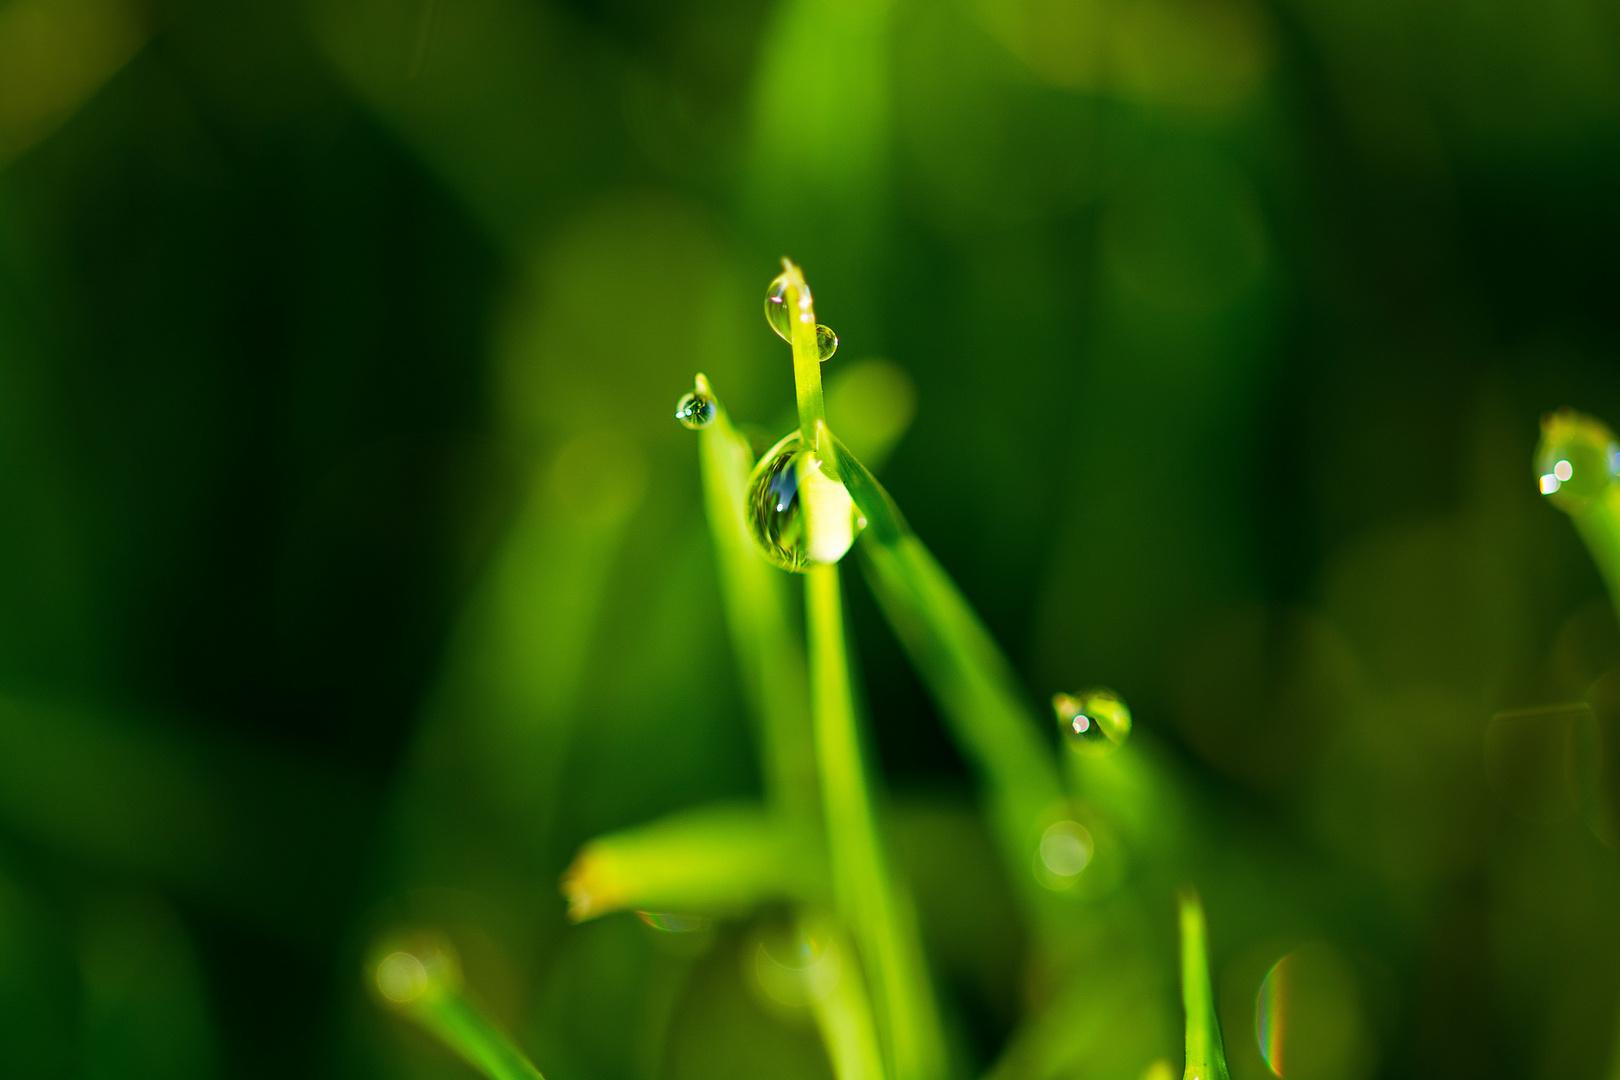 Morgentau im grünen.......